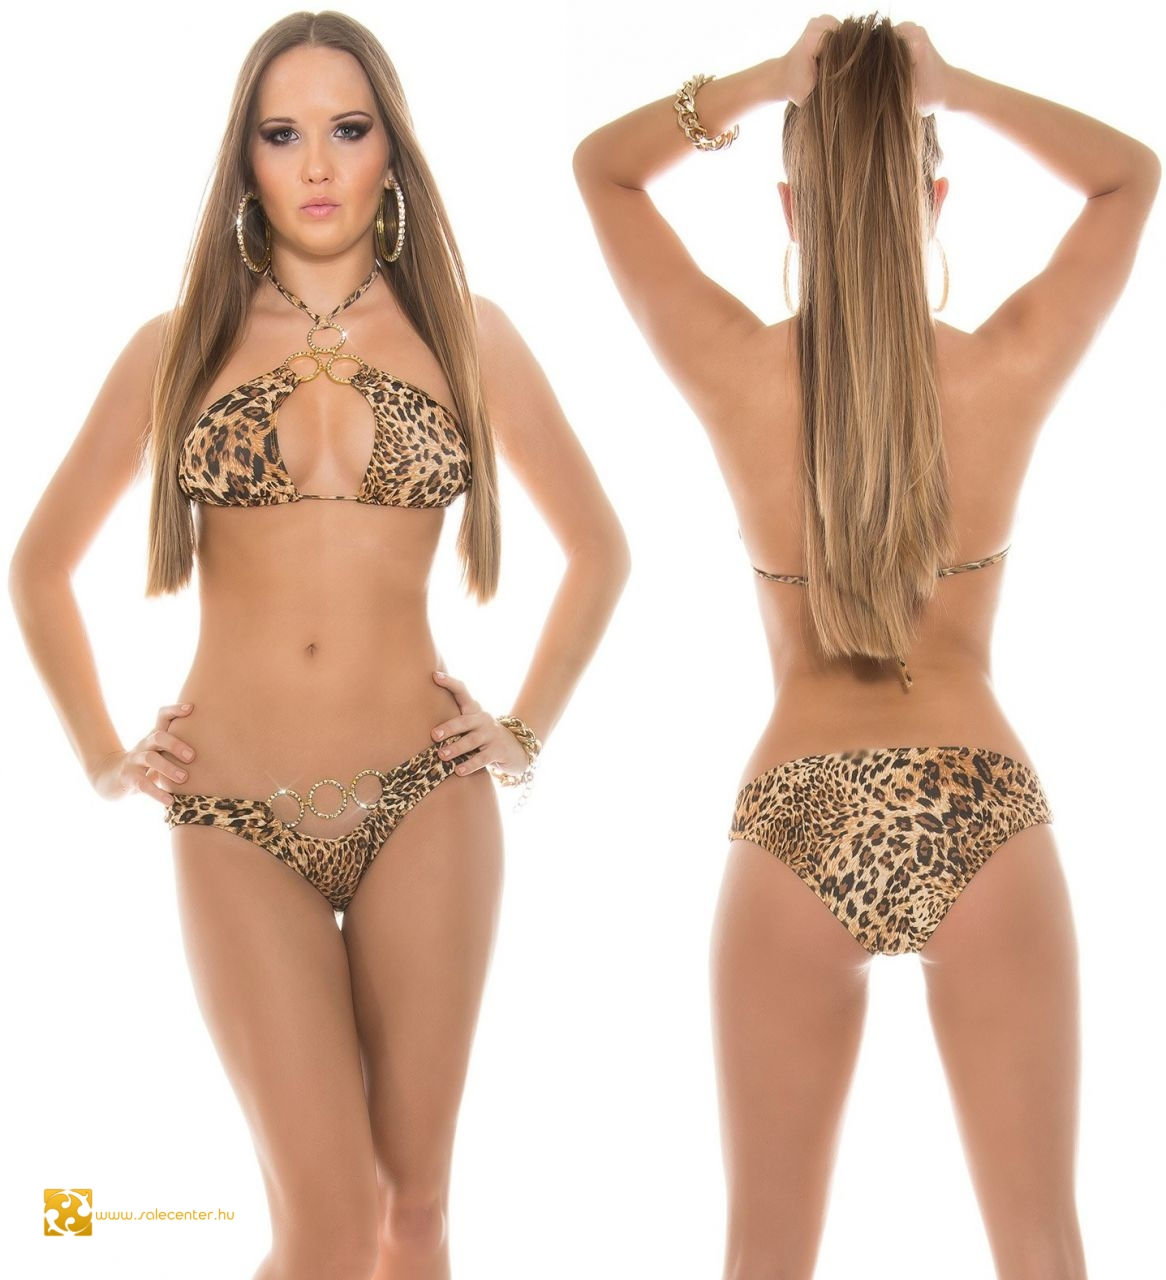 ab1e958a66 bikini, szexi bikini, dögös bikini, fürdőruha, szexi bikini